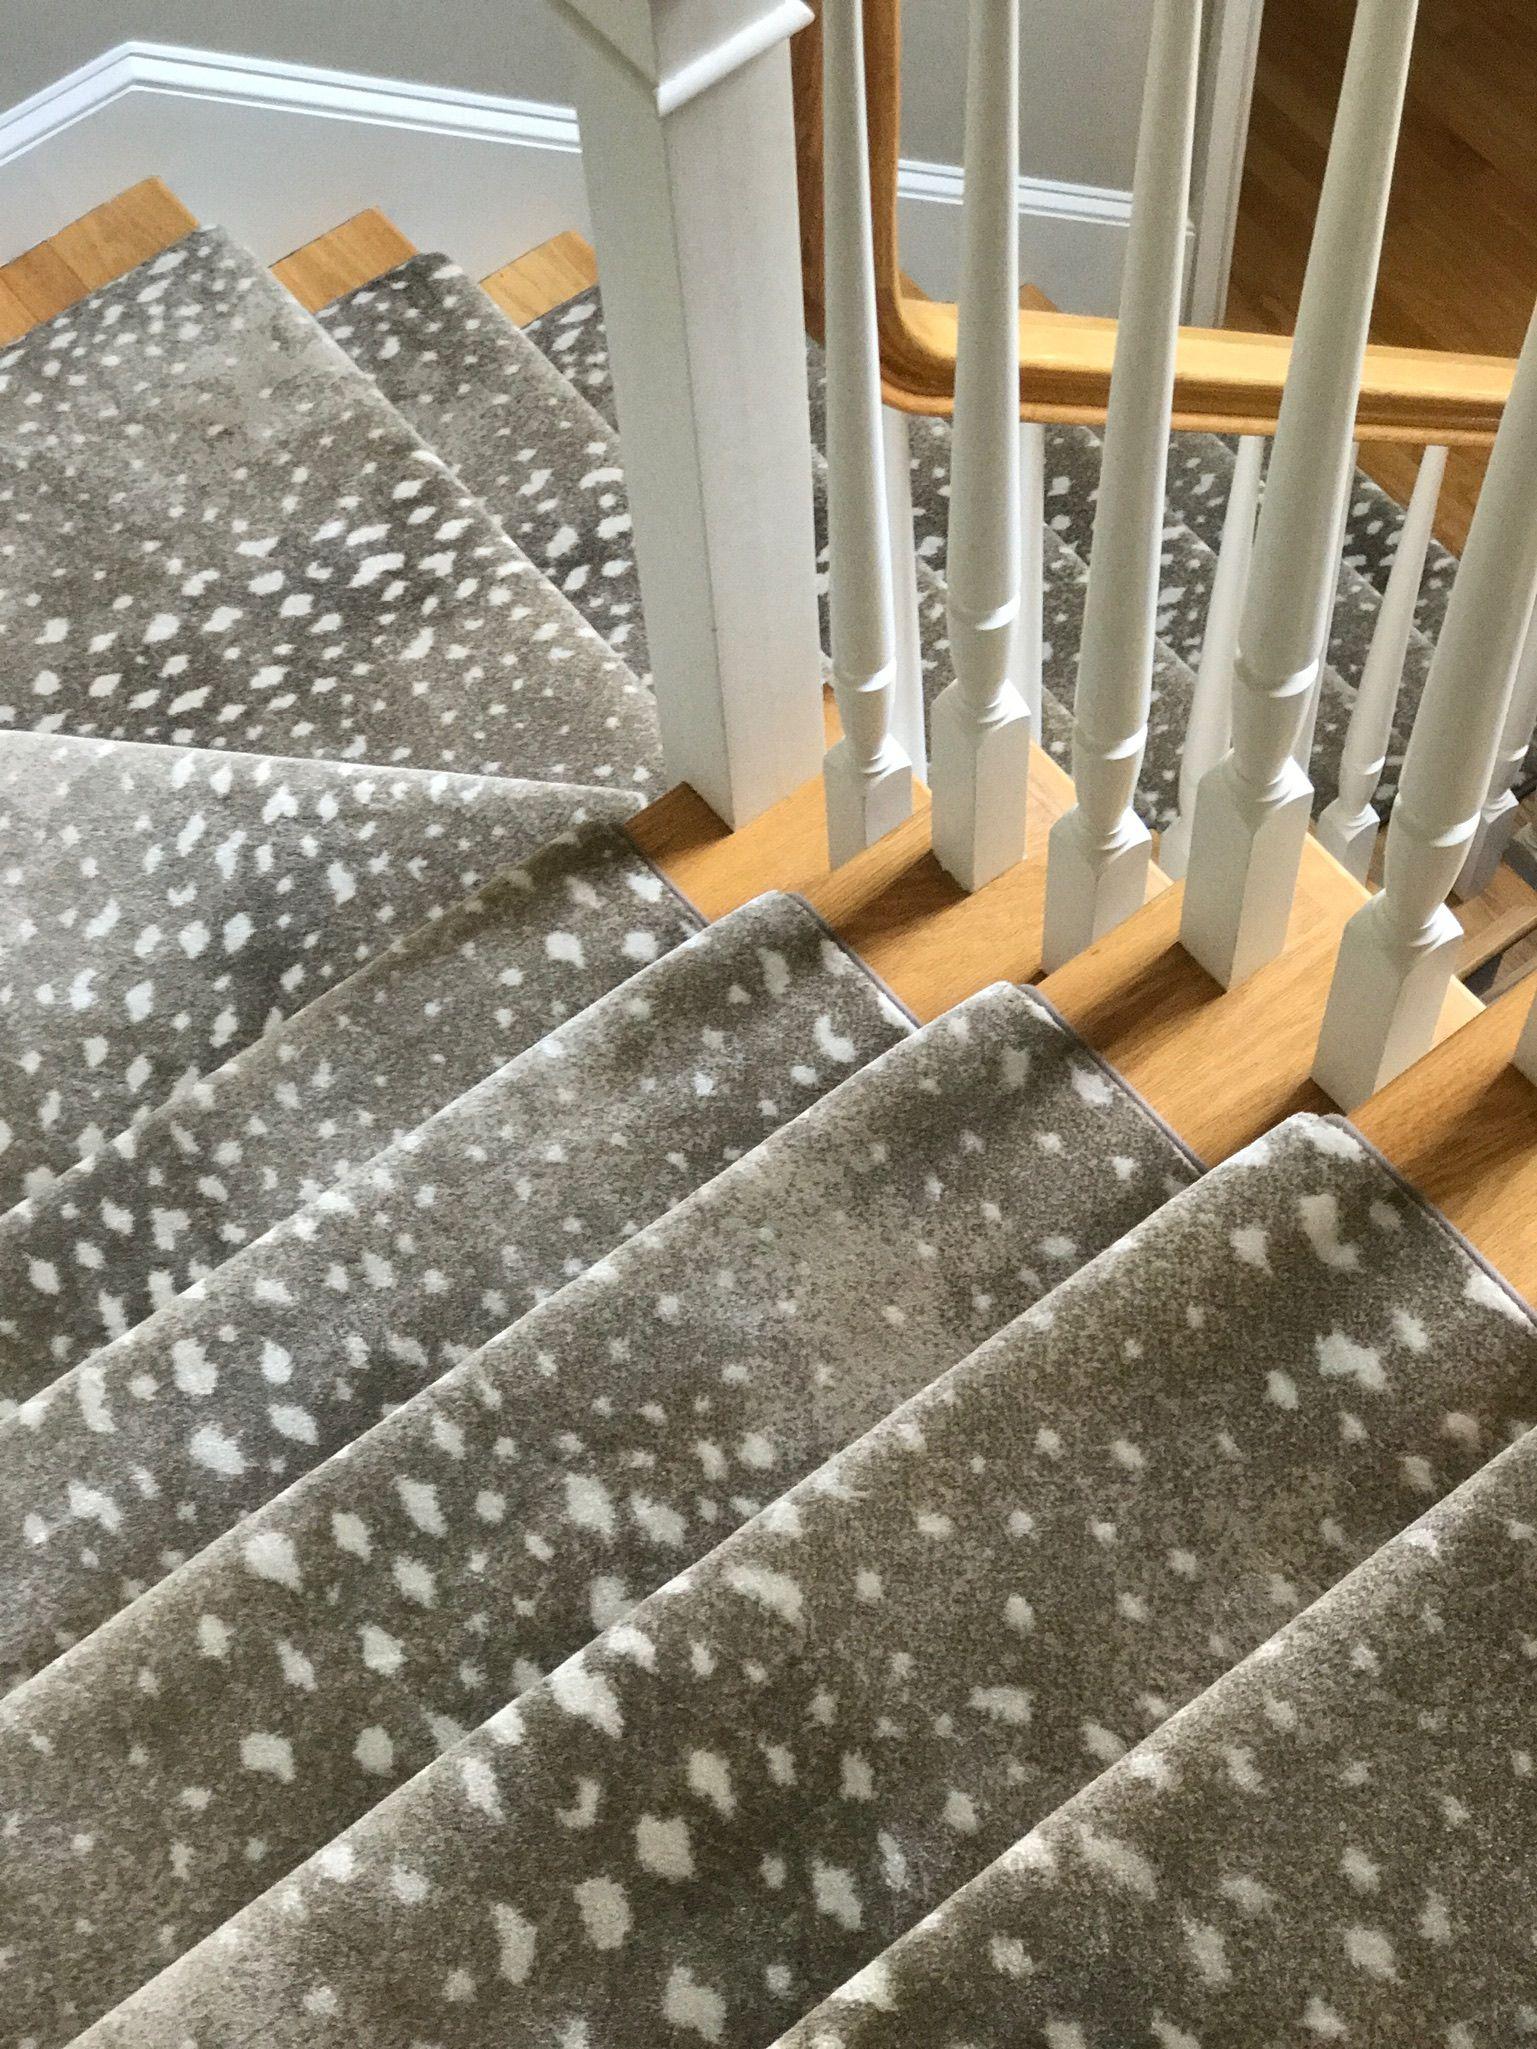 Stairs Stair Runner Stair Runner Carpet Exterior Stairs | Outdoor Stair Carpet Runner | Anti Slip Stair | Porch | Flooring | Carpet Workroom | Indoor Outdoor